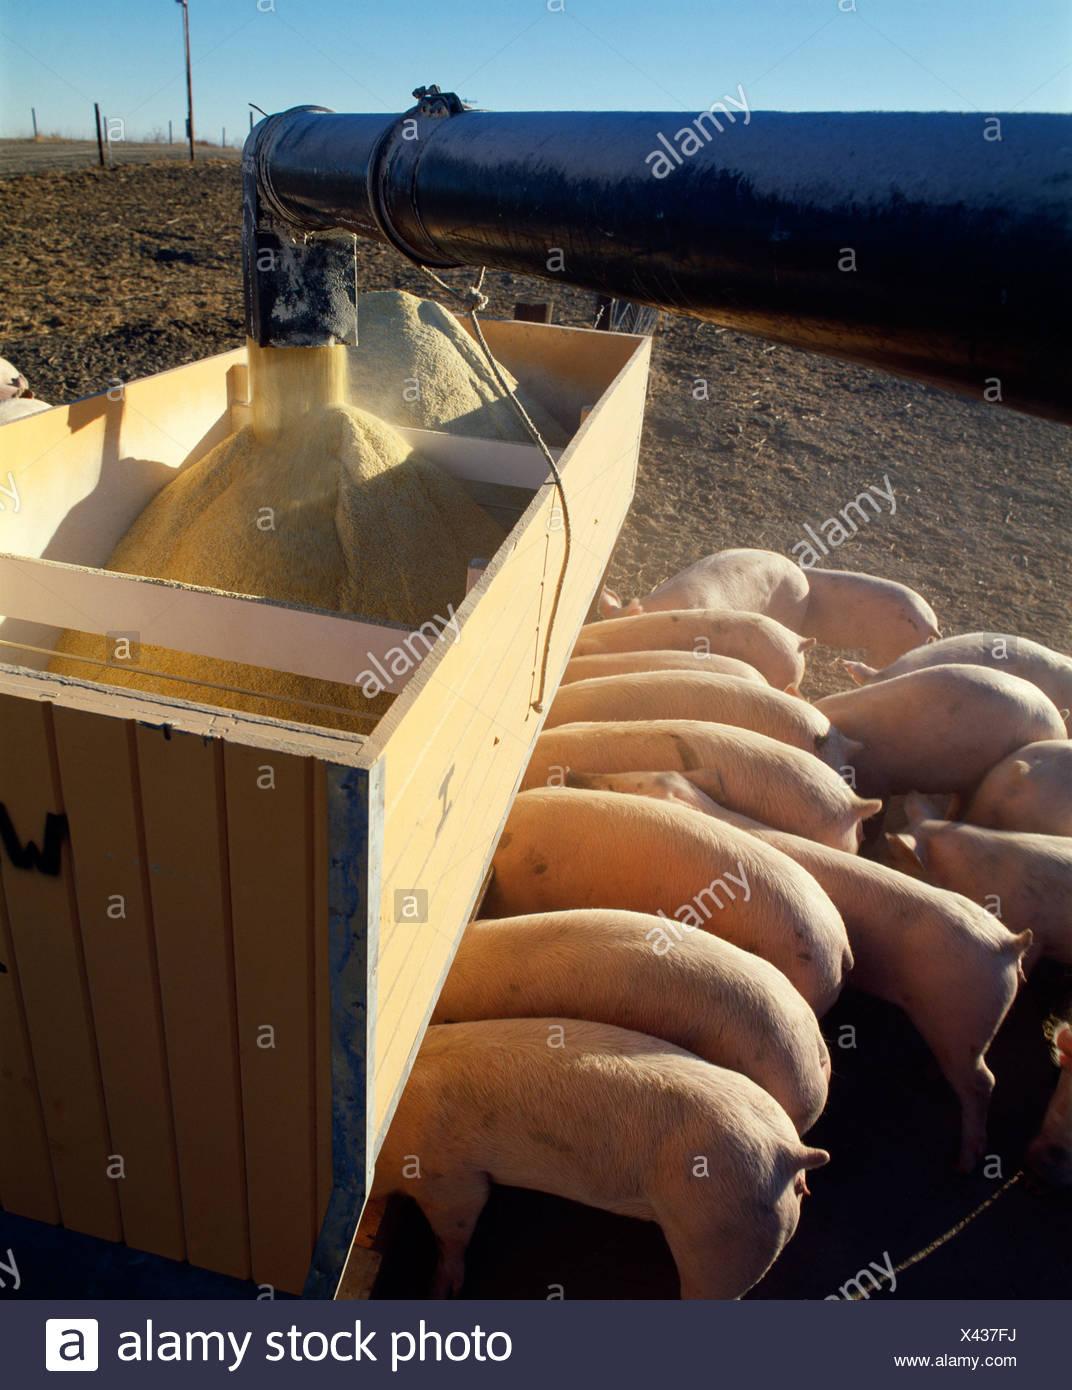 FEEDING 125-175 LB CROSSBRED GILTS / NEBRASKA - Stock Image